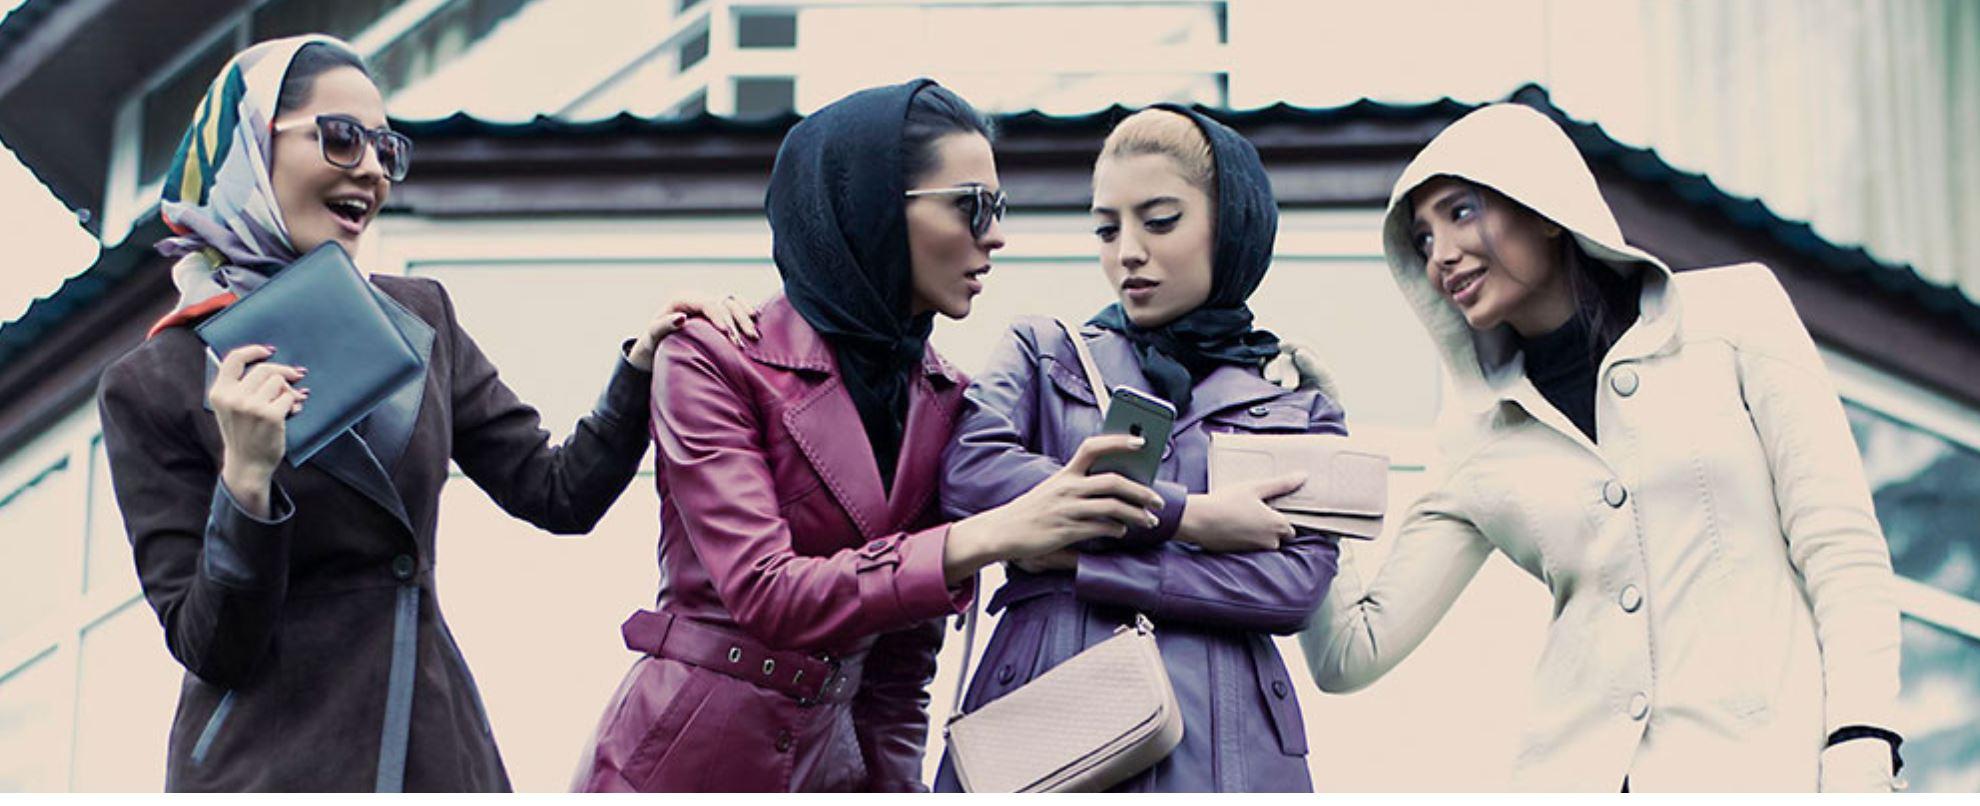 2016-12-3-10-44-banner1.jpgبرترین چرم ایرانی با برند ایرانی، چرم مشهد